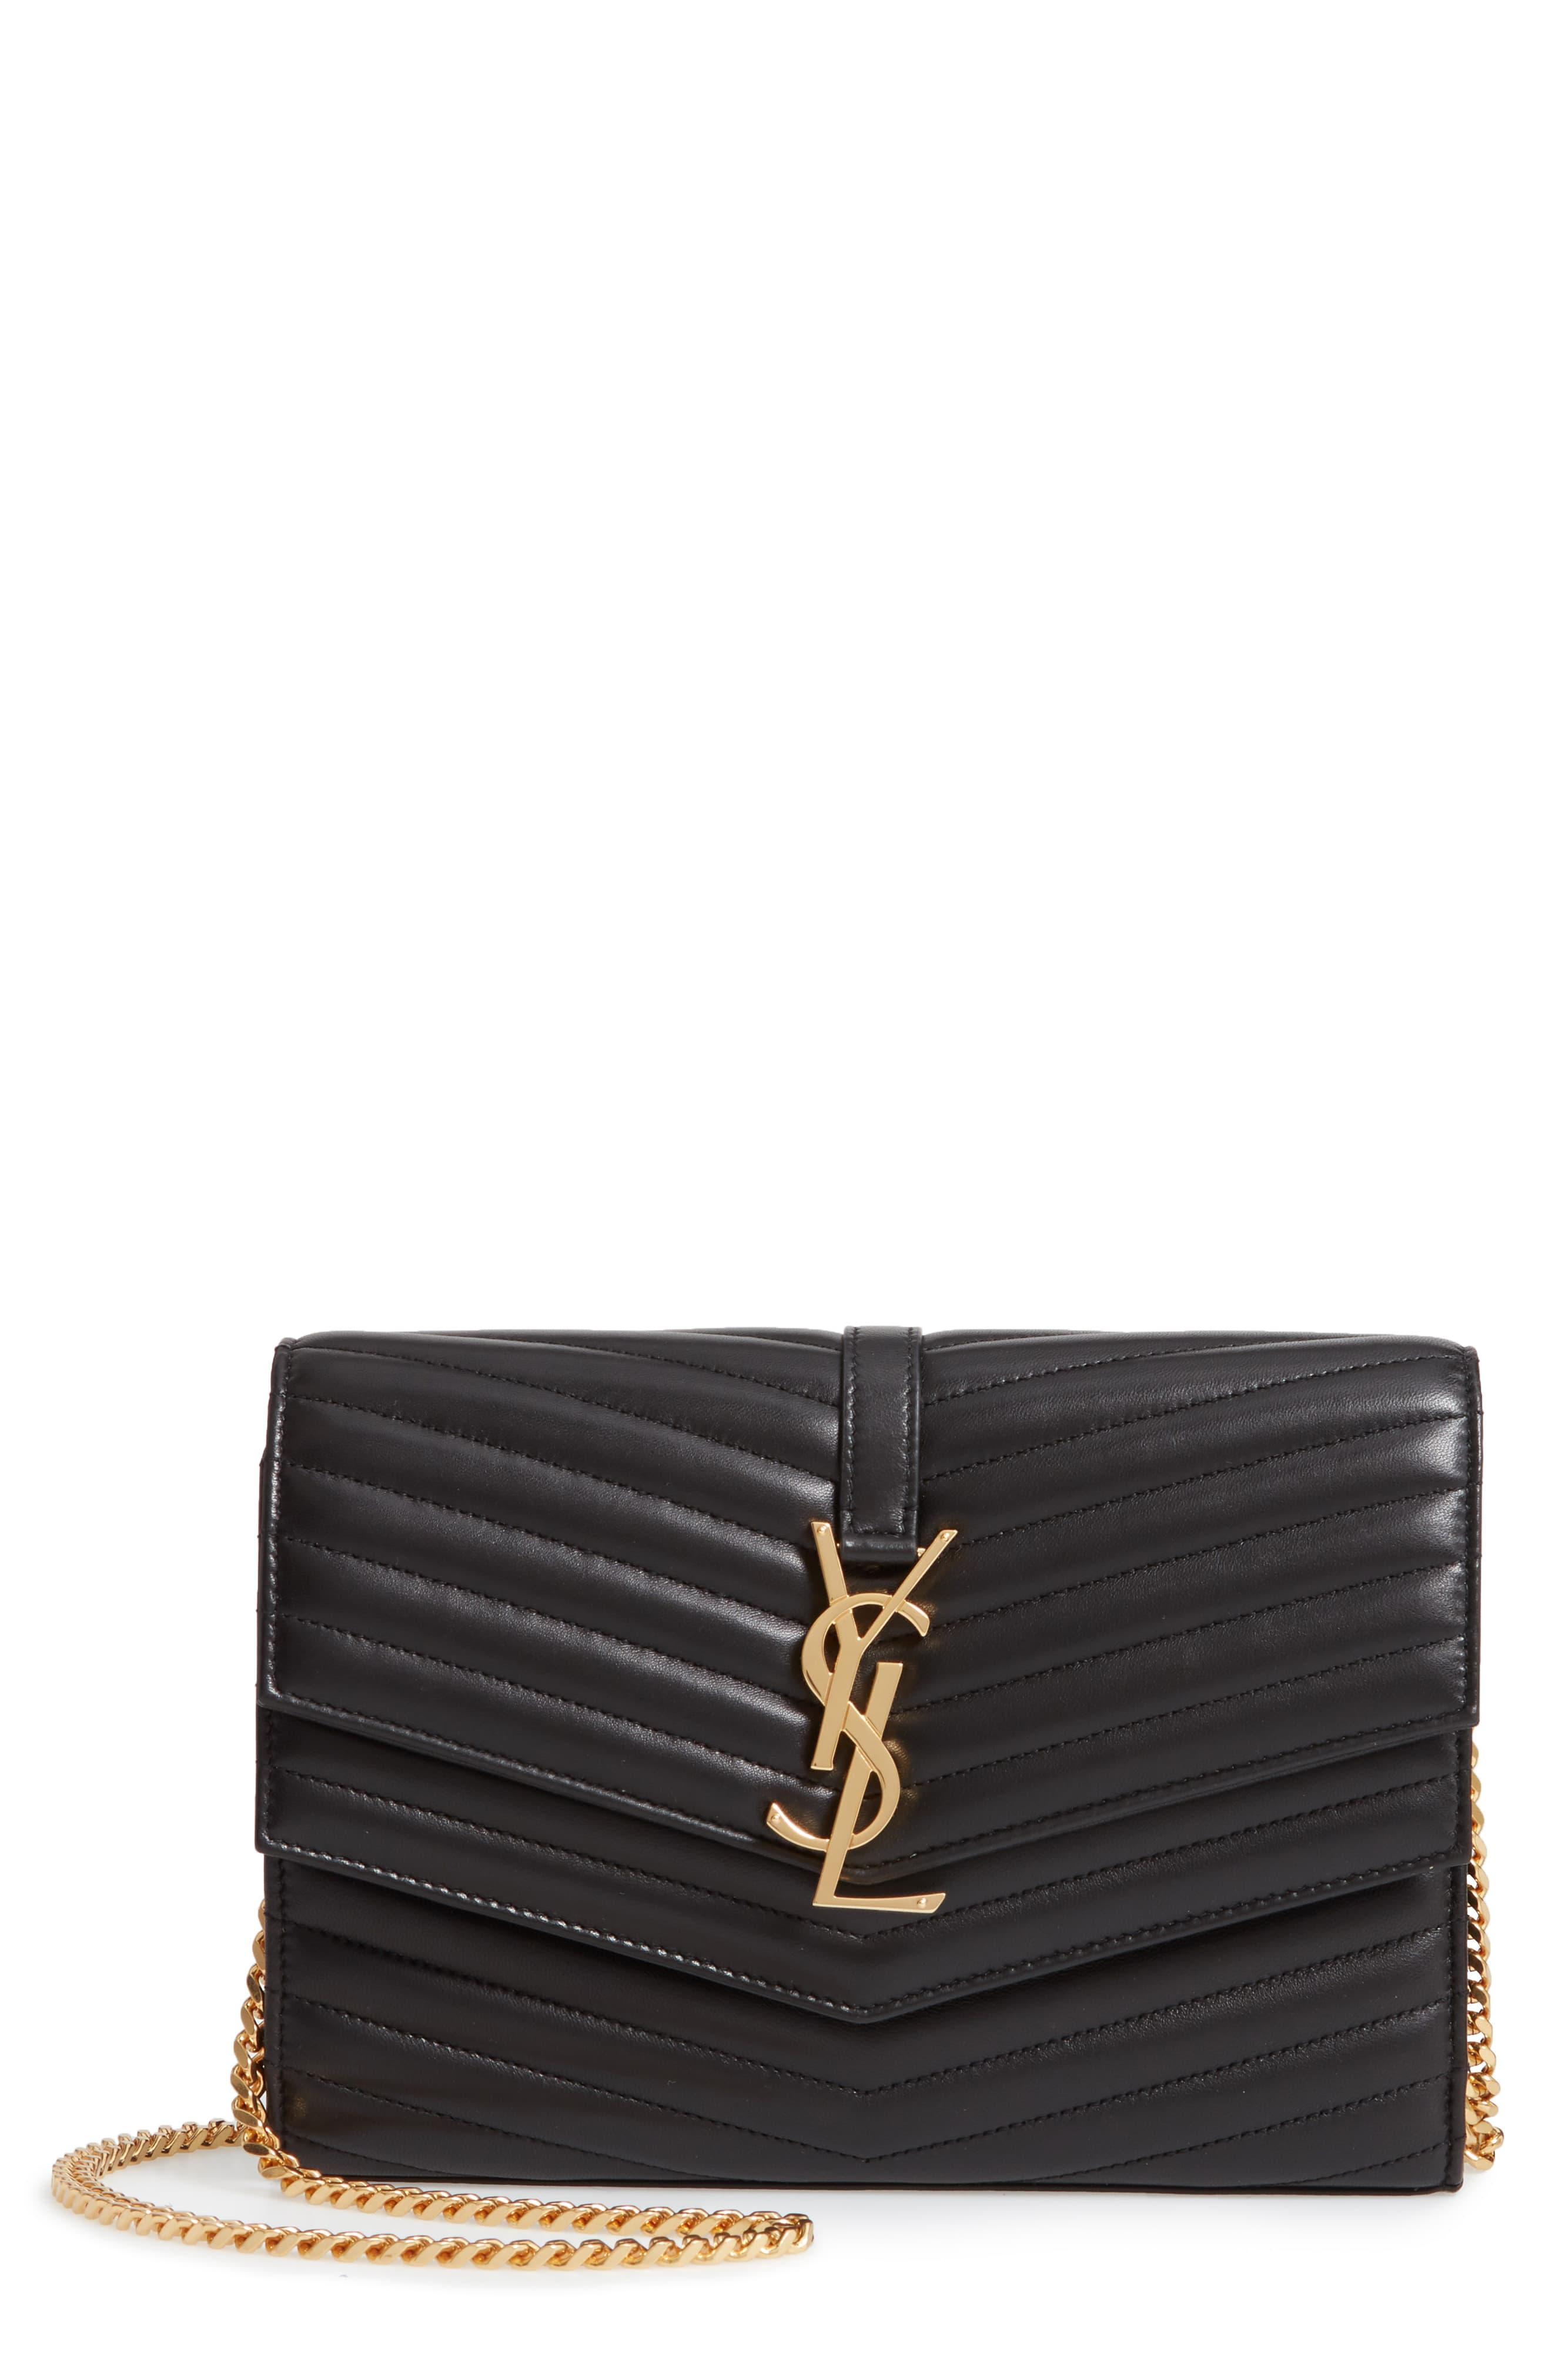 8c9175e27e6 Women's Saint Laurent Sulpice Leather Crossbody Wallet - Black in ...